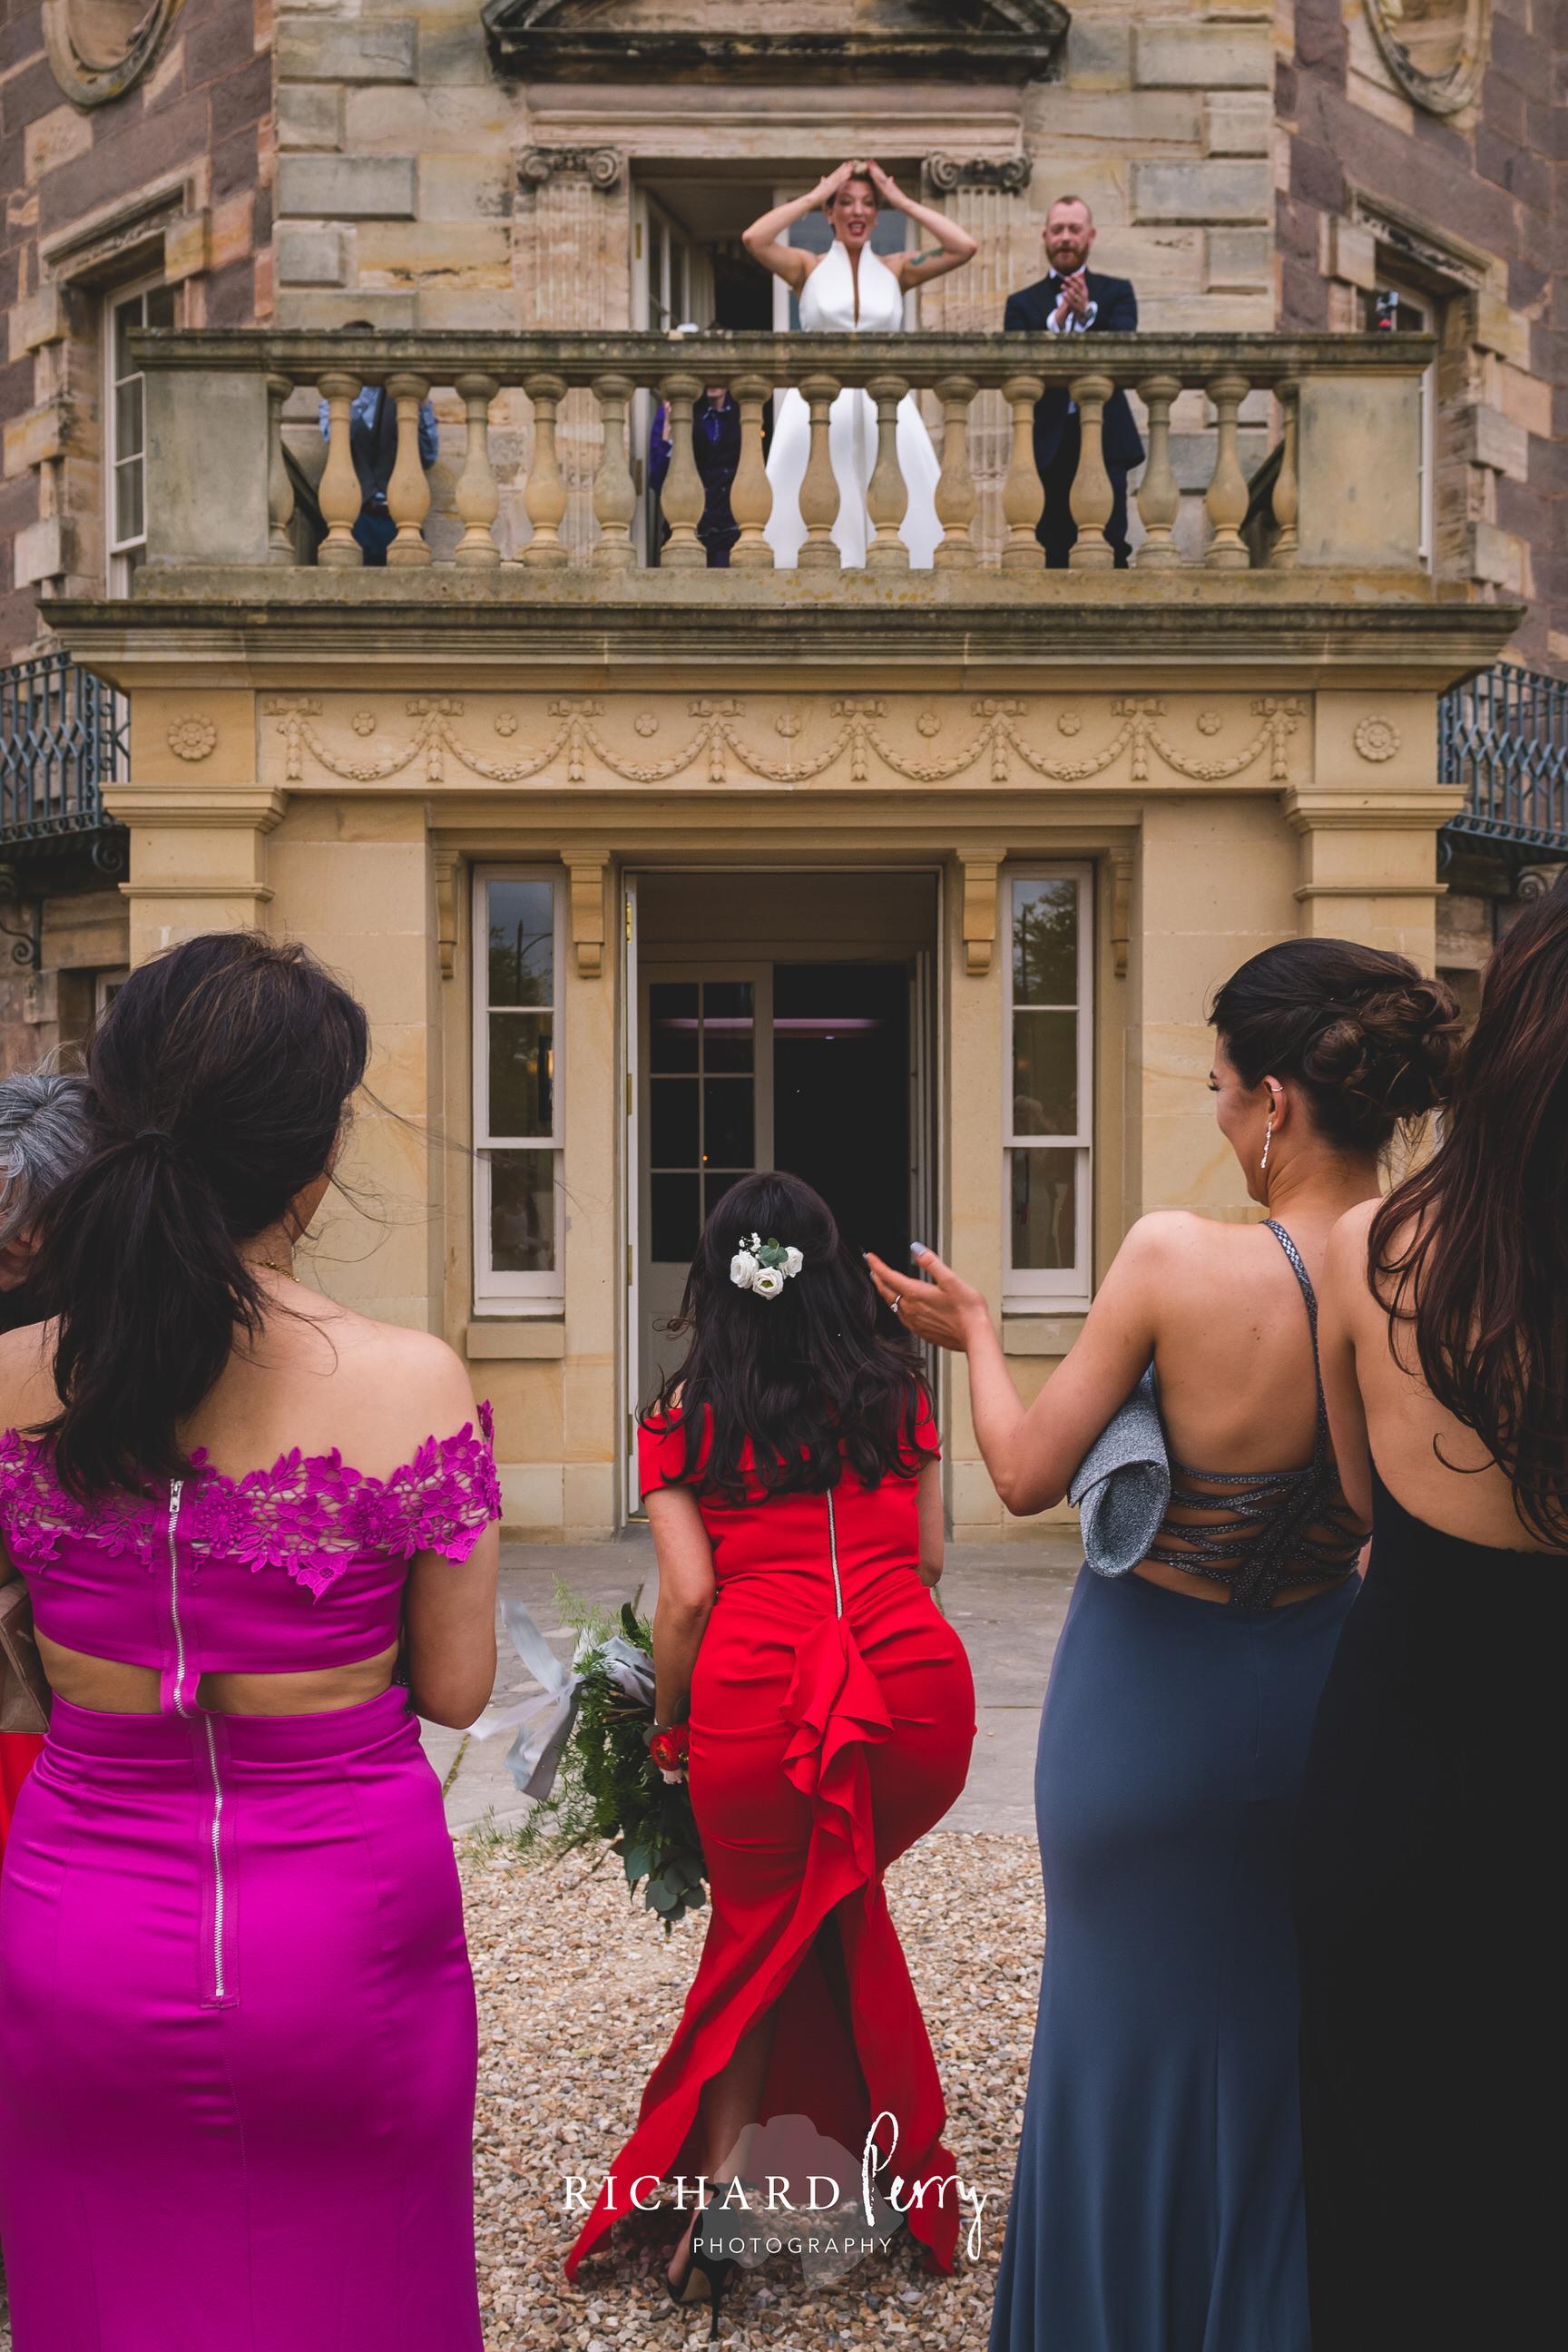 yorkshire-wedding-photographer-destination-archerfield-house-20.jpg